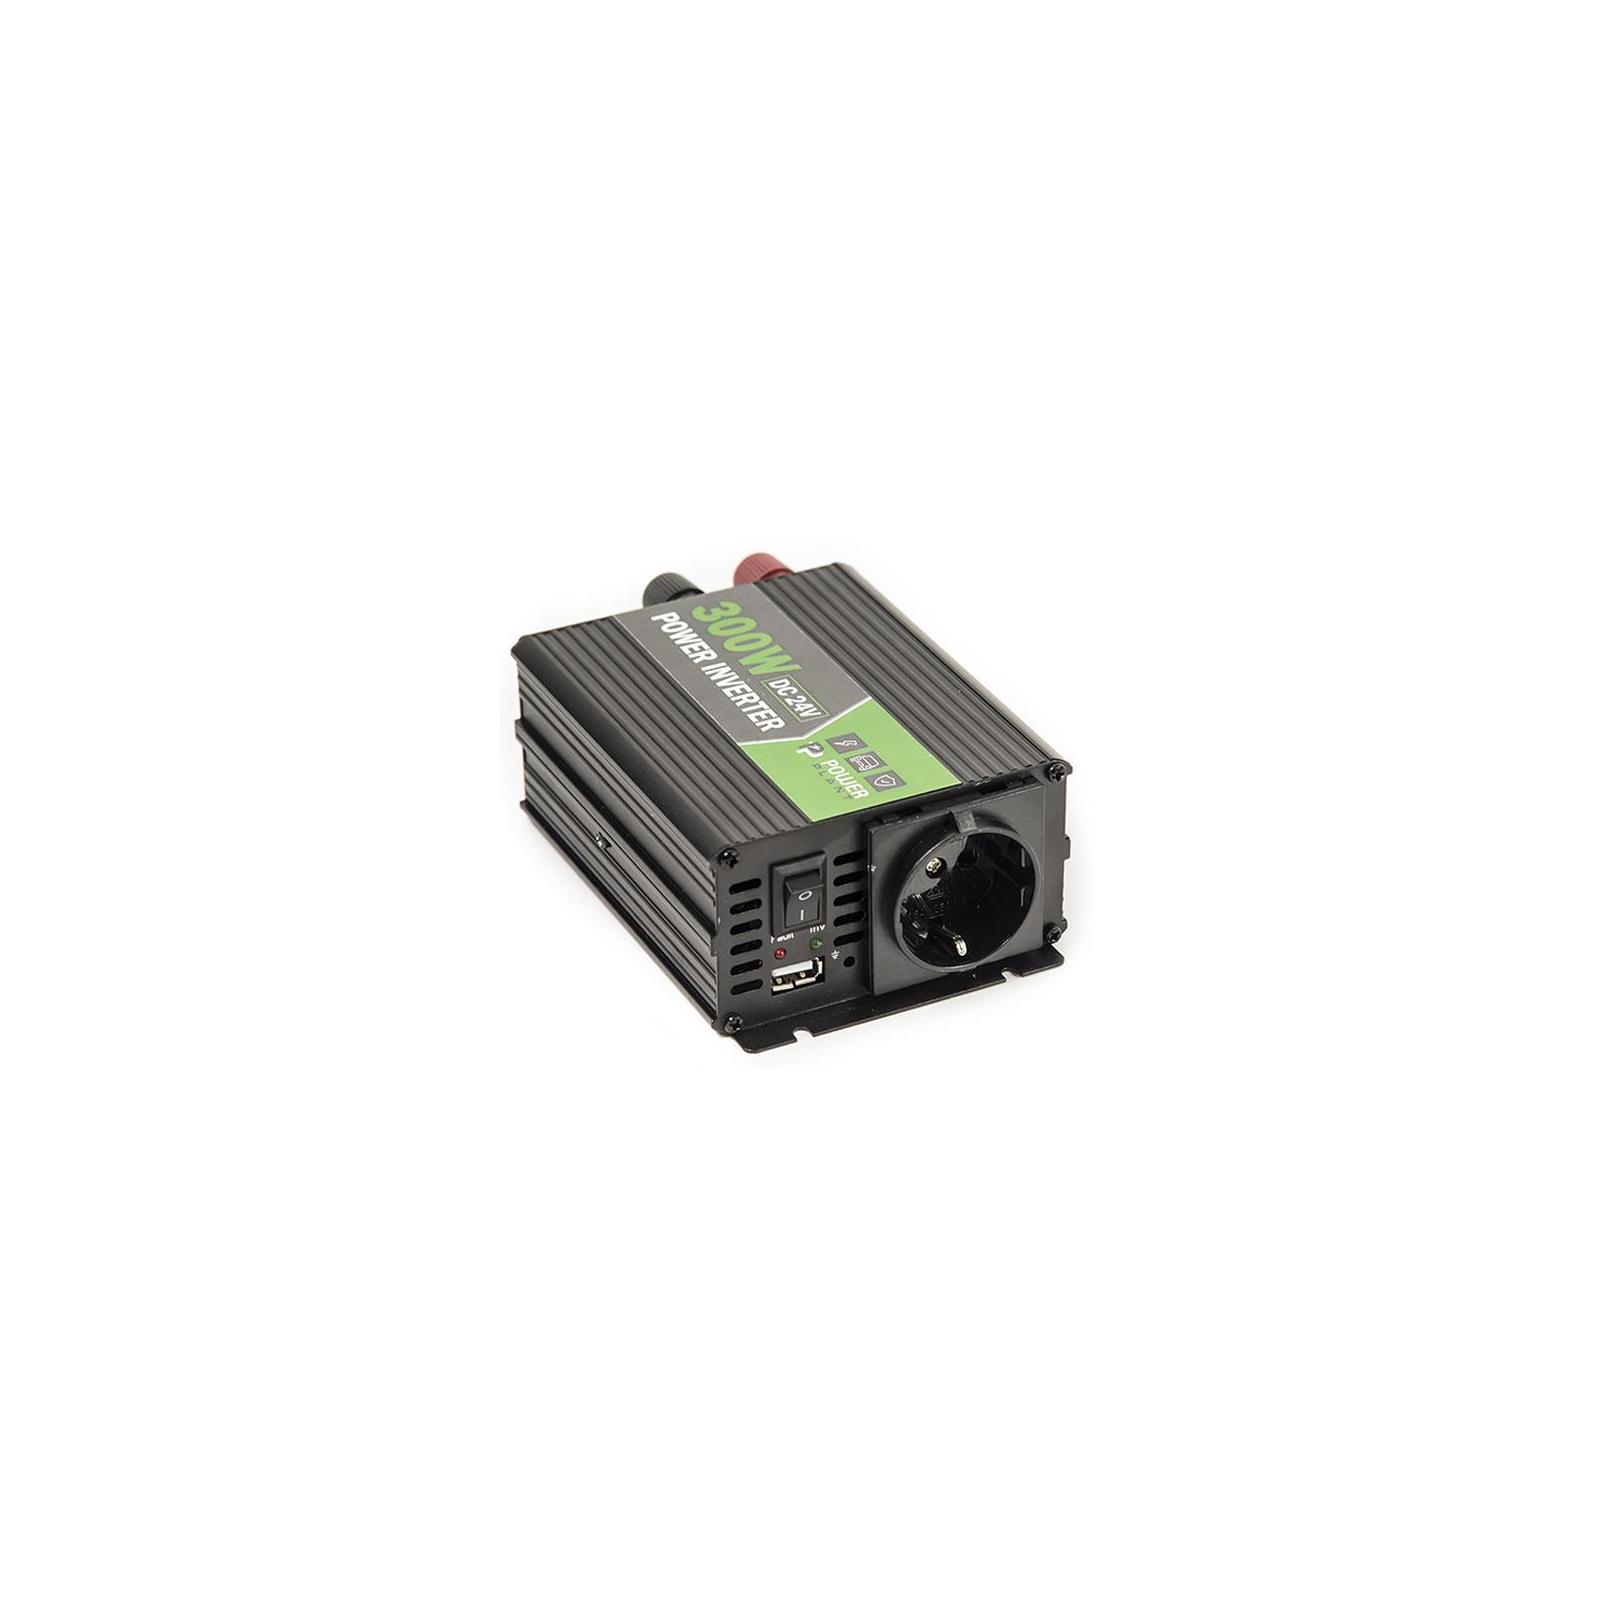 Автомобильный инвертор 24V/220V 300W, USB 5V 1A, HYM300-242 PowerPlant (KD00MS0002) изображение 6